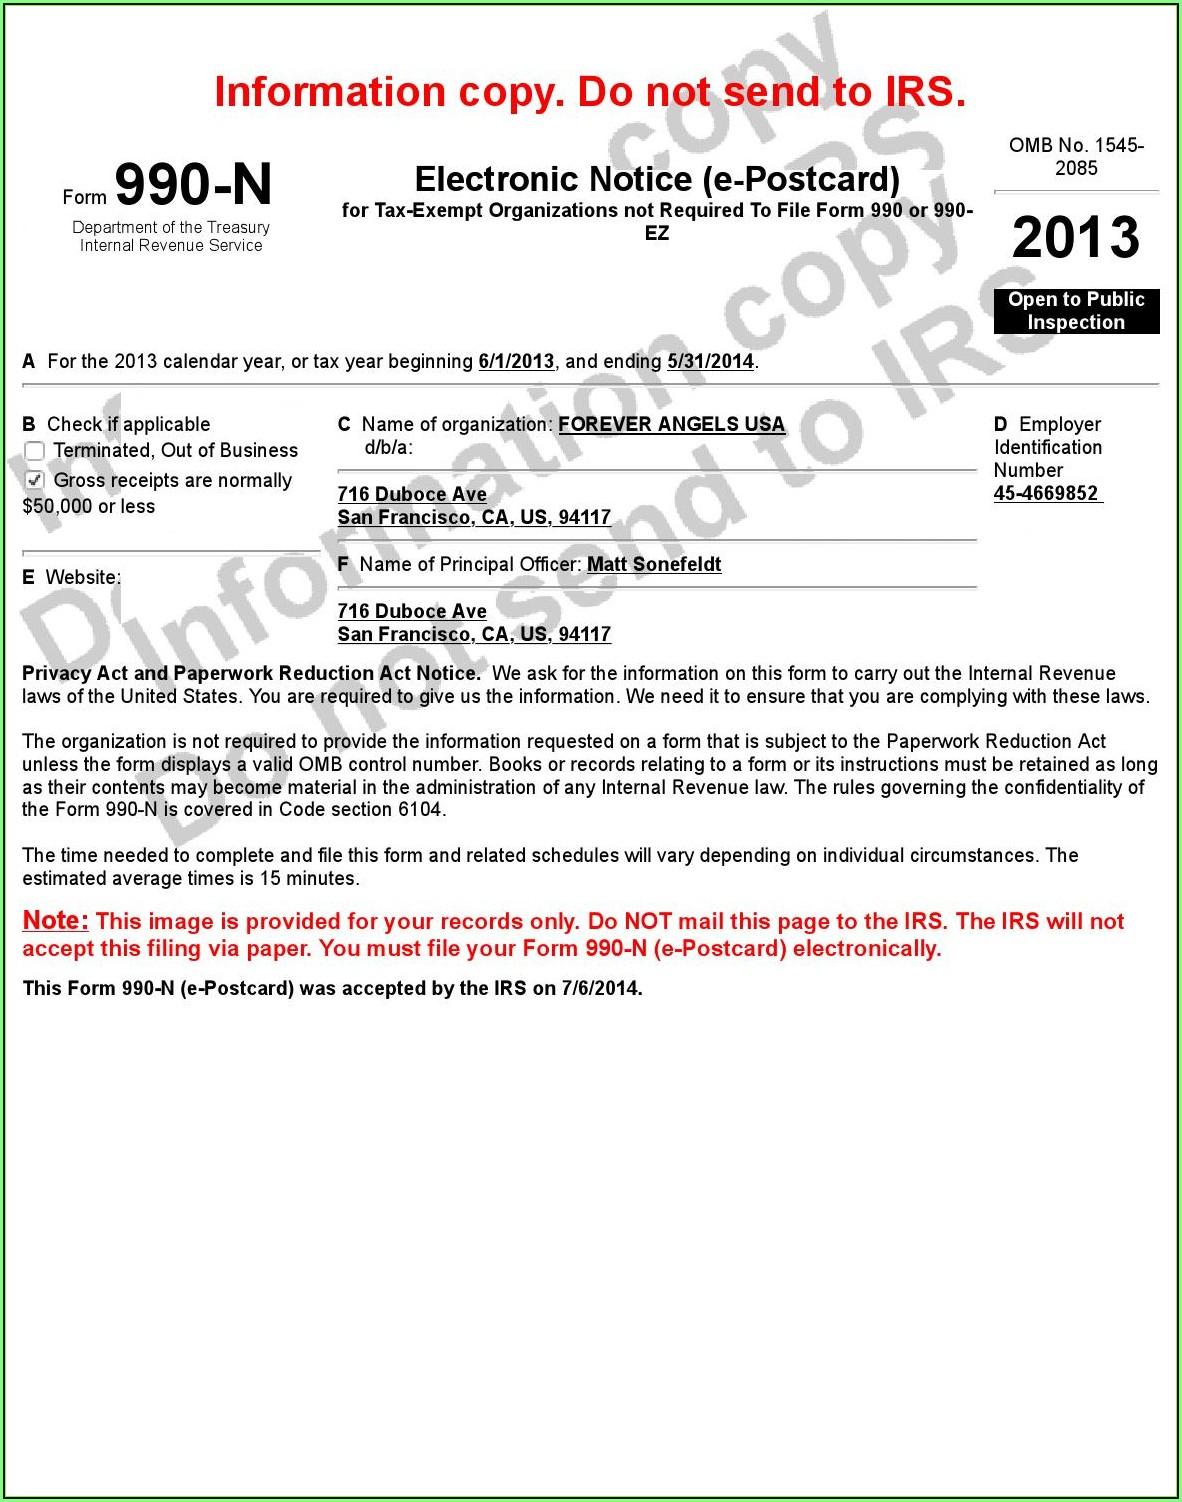 2013 Irs Form 990 N (e Postcard)